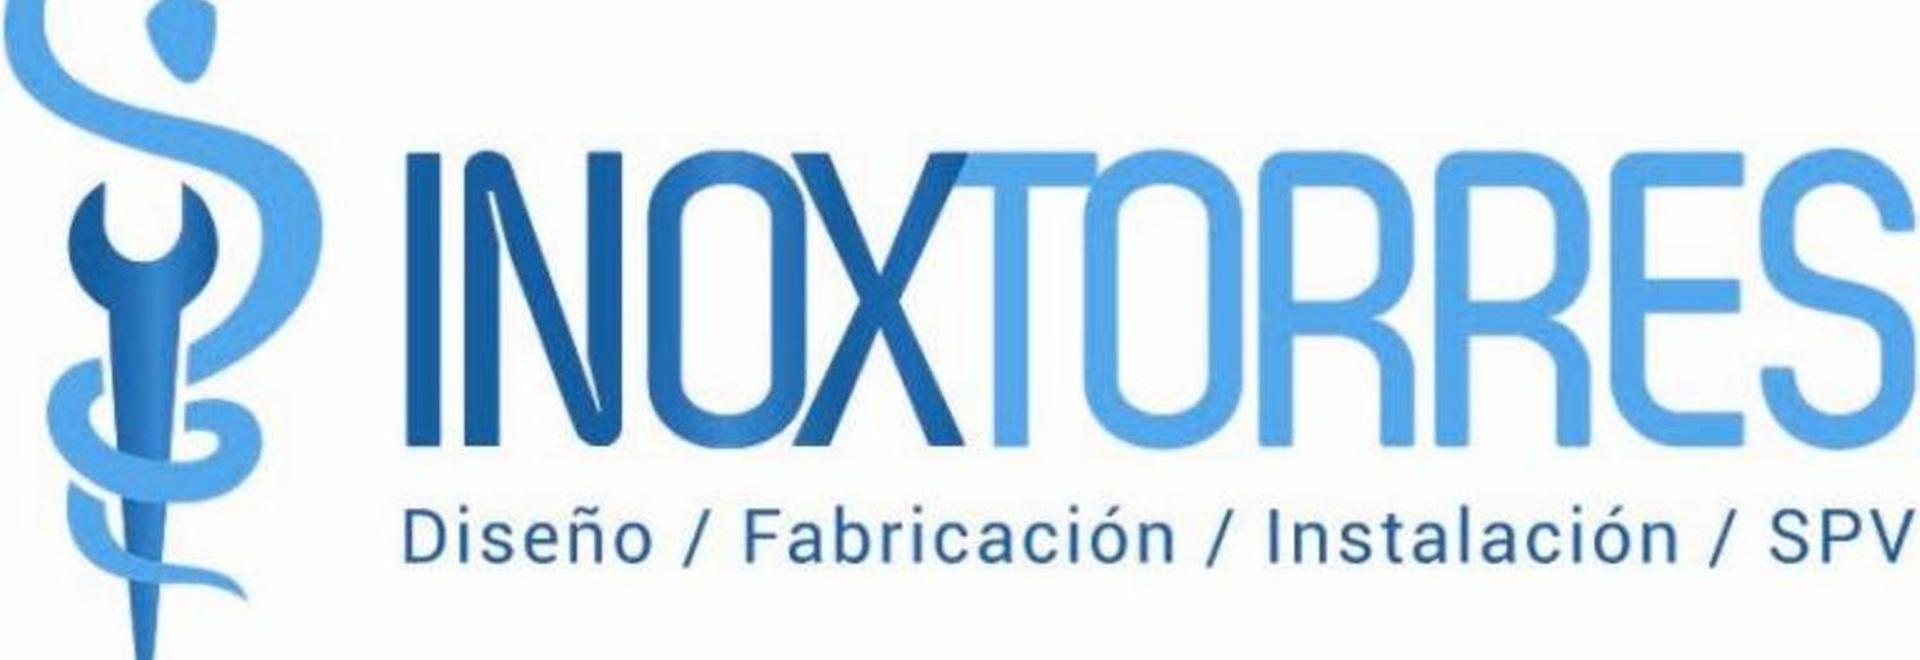 New Factory in Martorelles - Barcelona - Spain